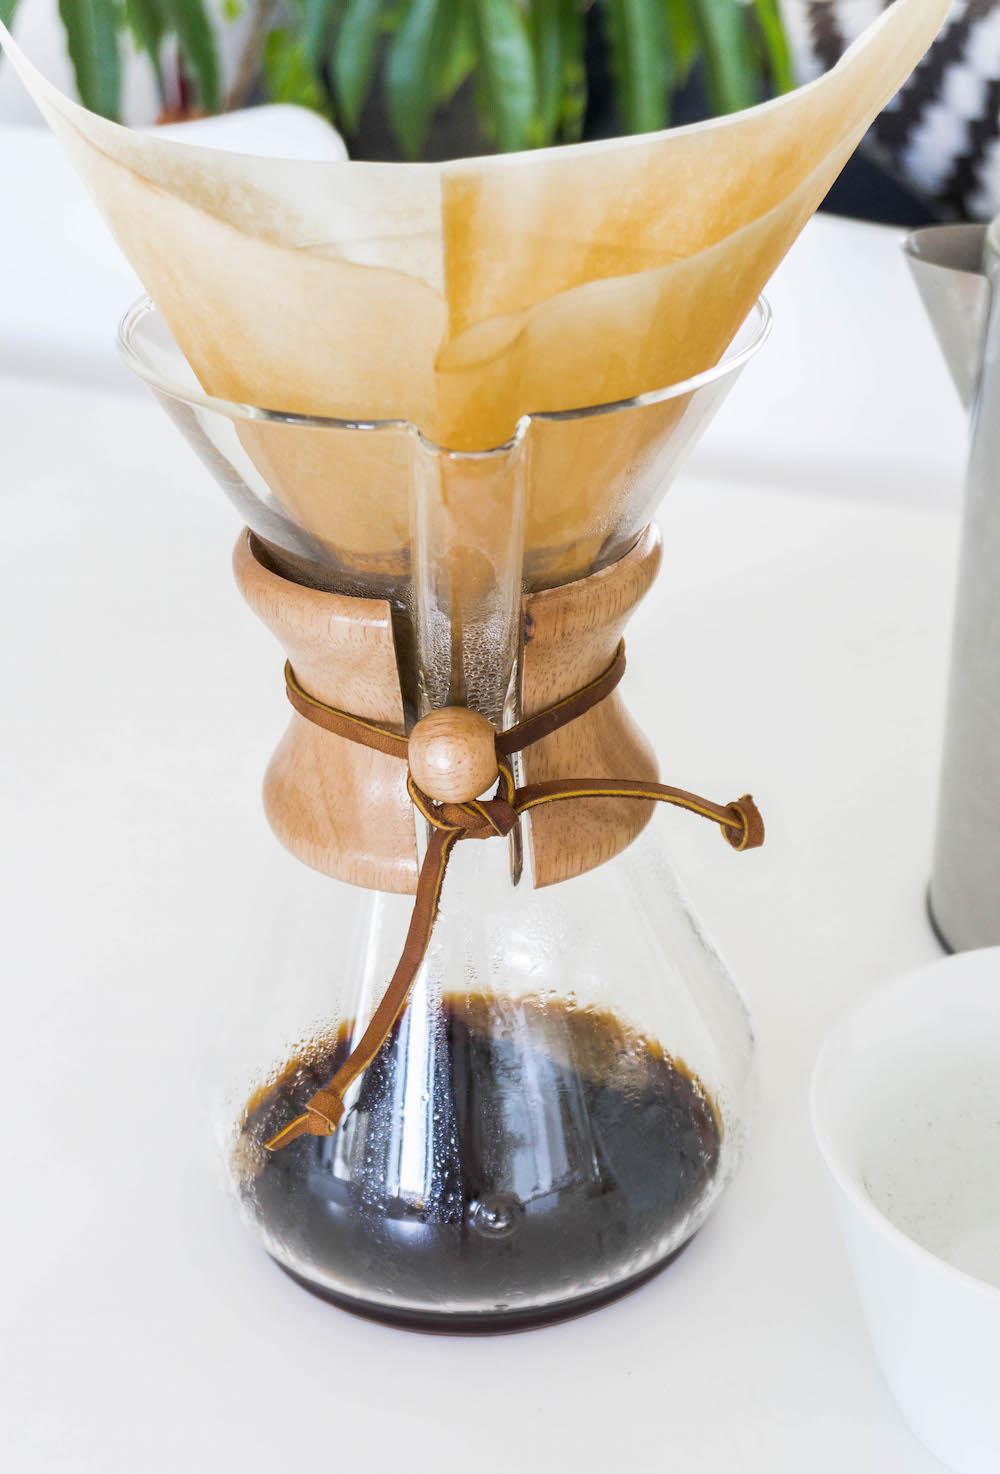 Kaffee kochen ohne strom ermellino - Kochen ohne strom ...